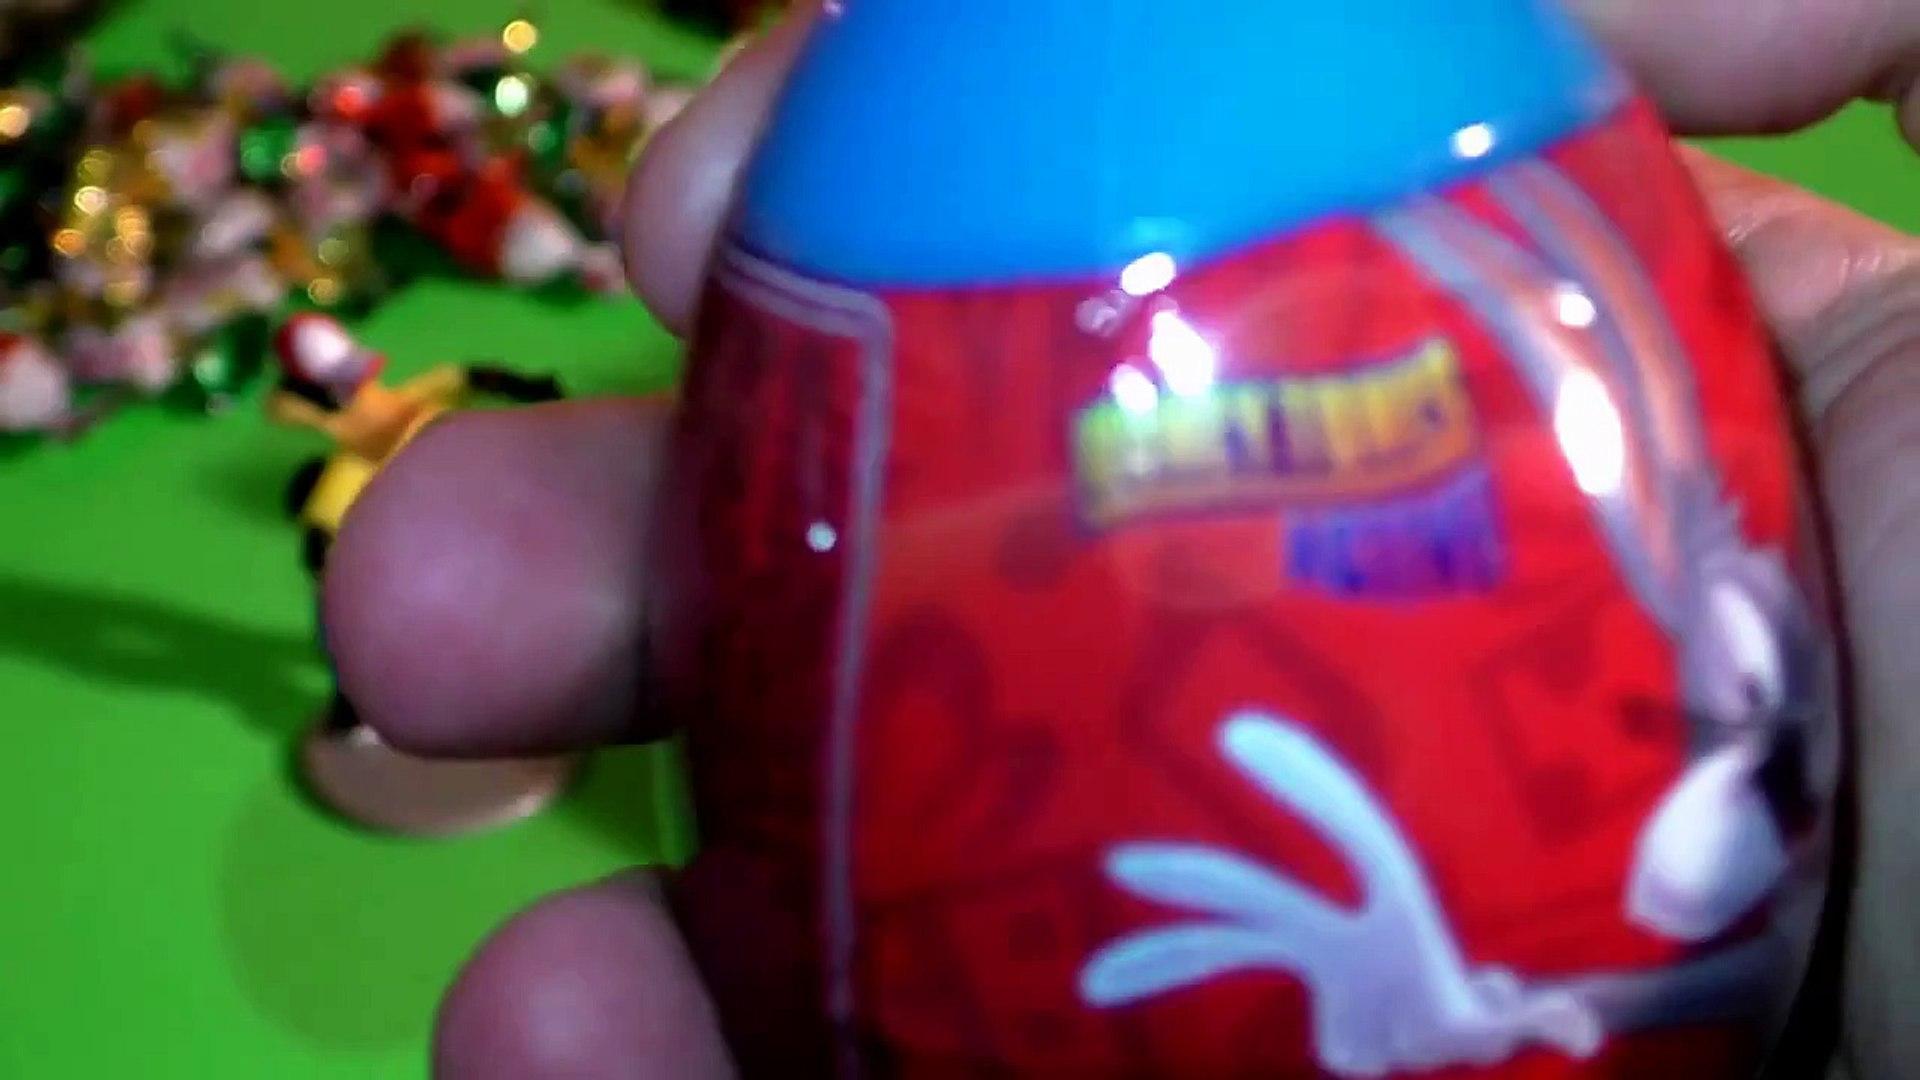 Looney Tunes Bugs Bunny Daffy Duck Tasmanian Devil Warner Brothers surprise eggs